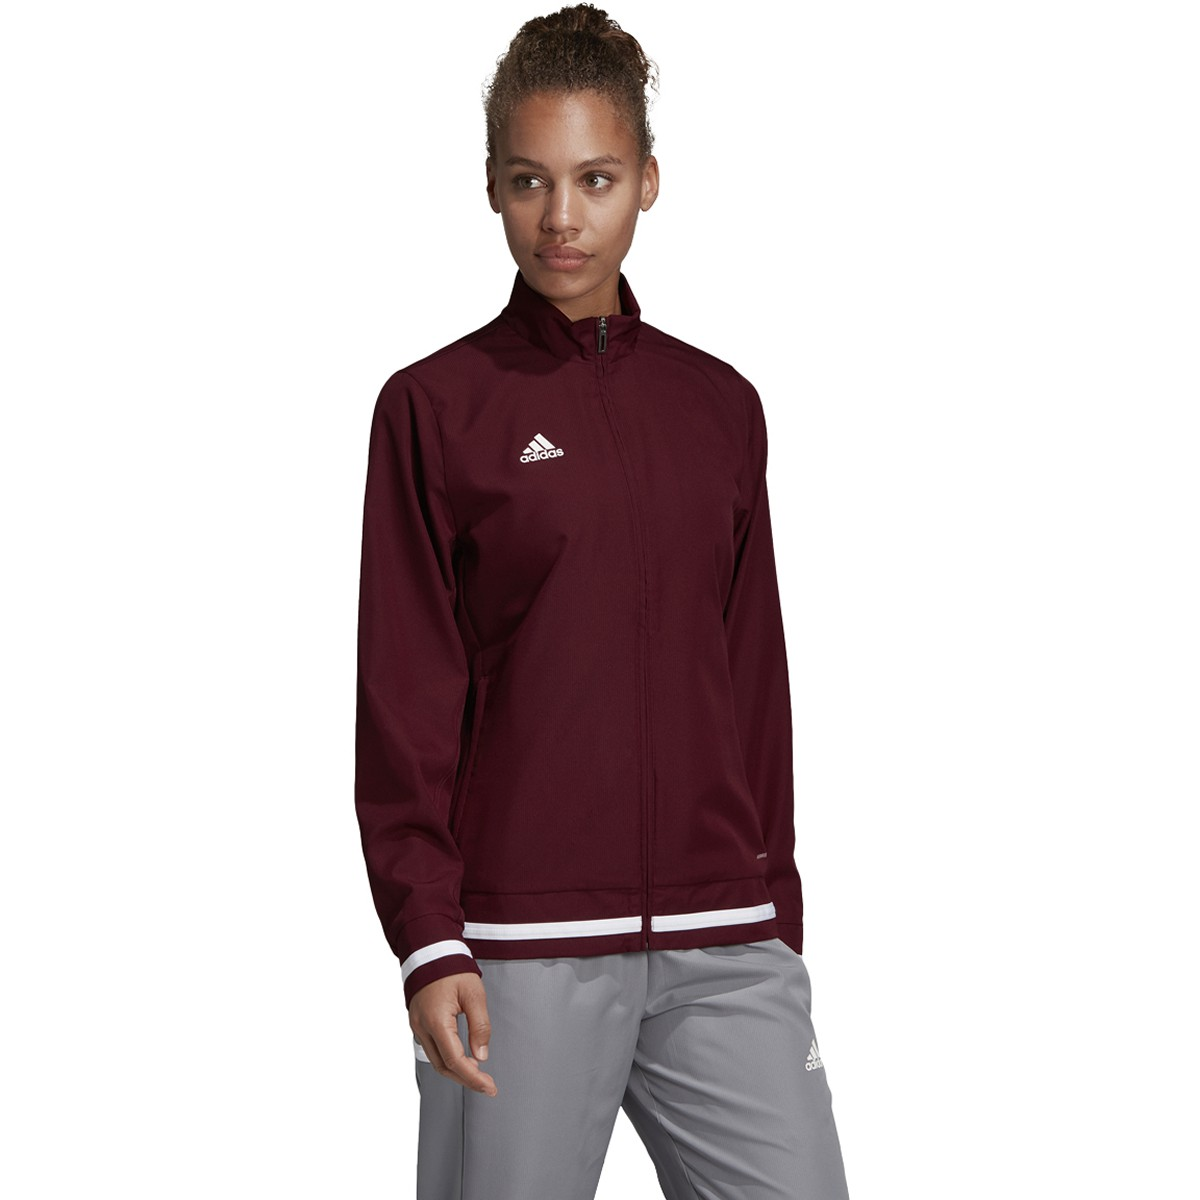 Adidas T19 Woven Jacket Womens